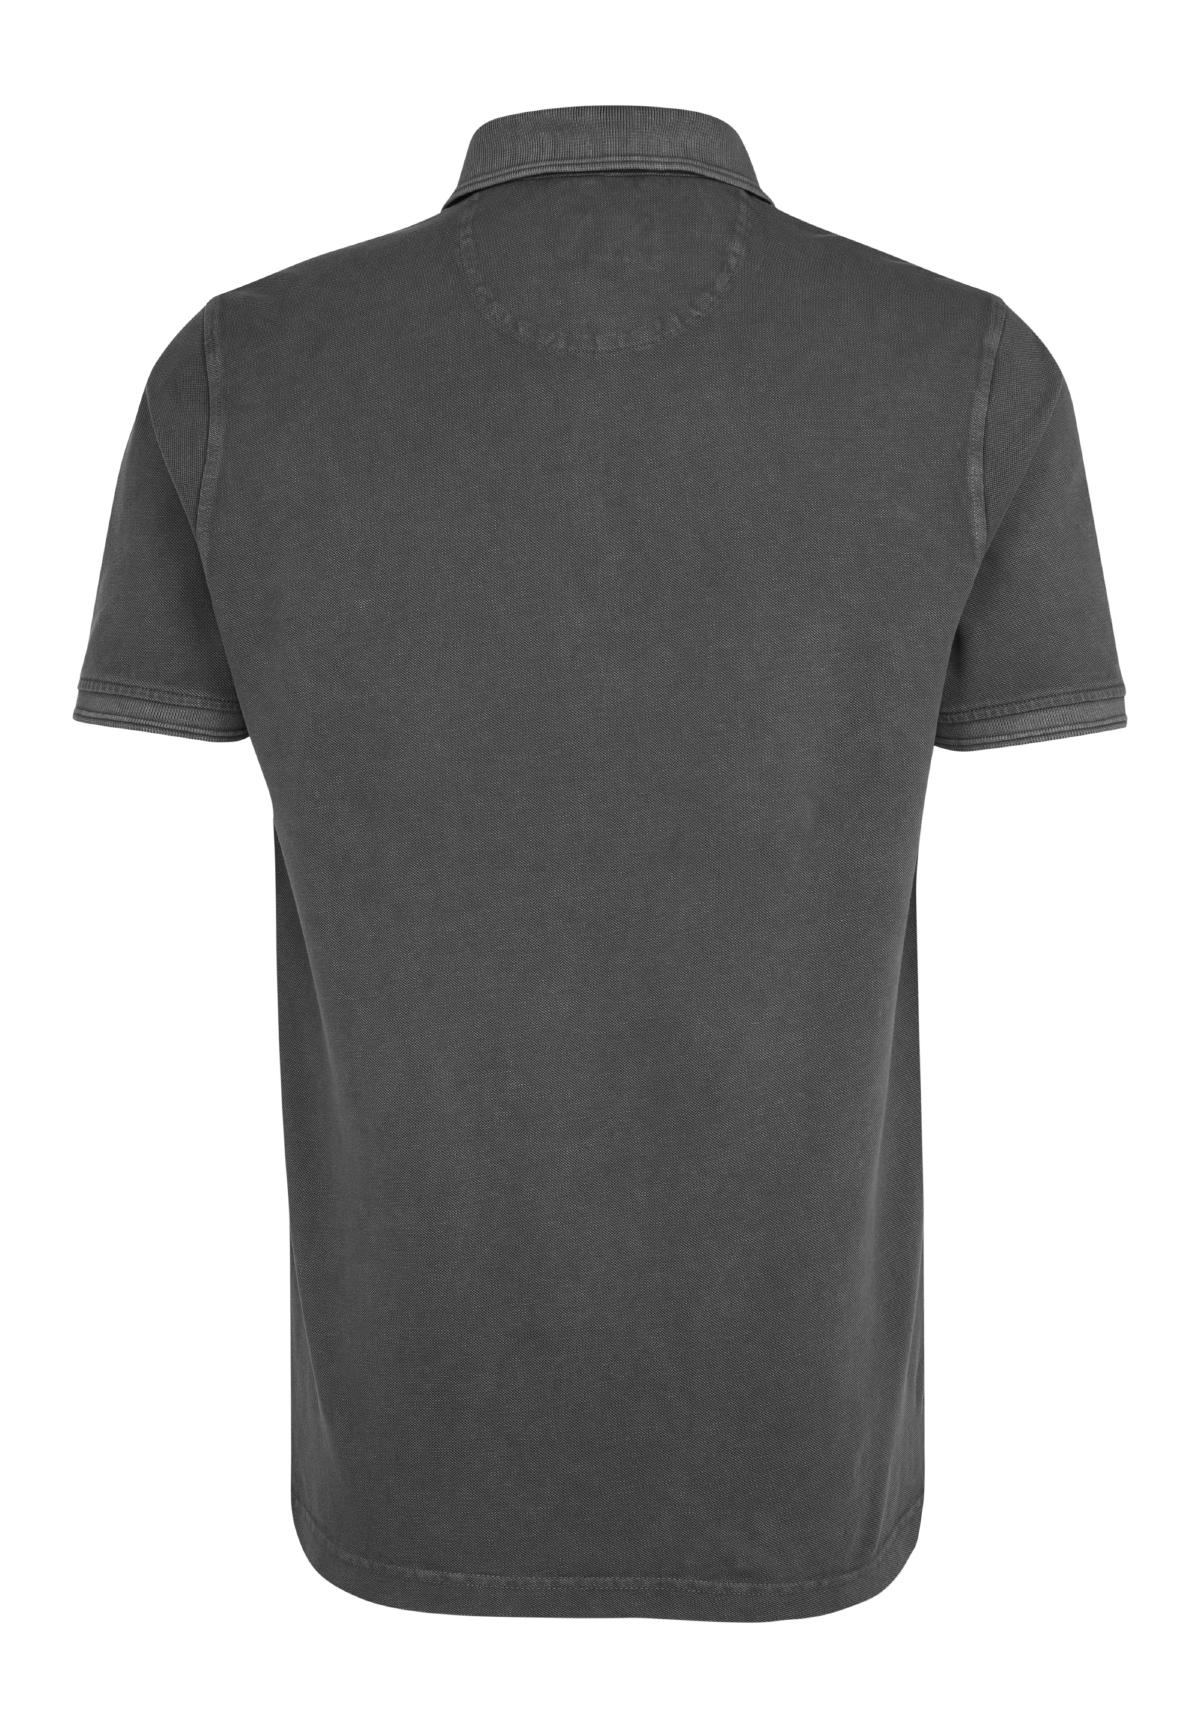 Camel-Active-Herren-Shirt-Poloshirt-Pique-Regular-Fit-NEU Indexbild 48